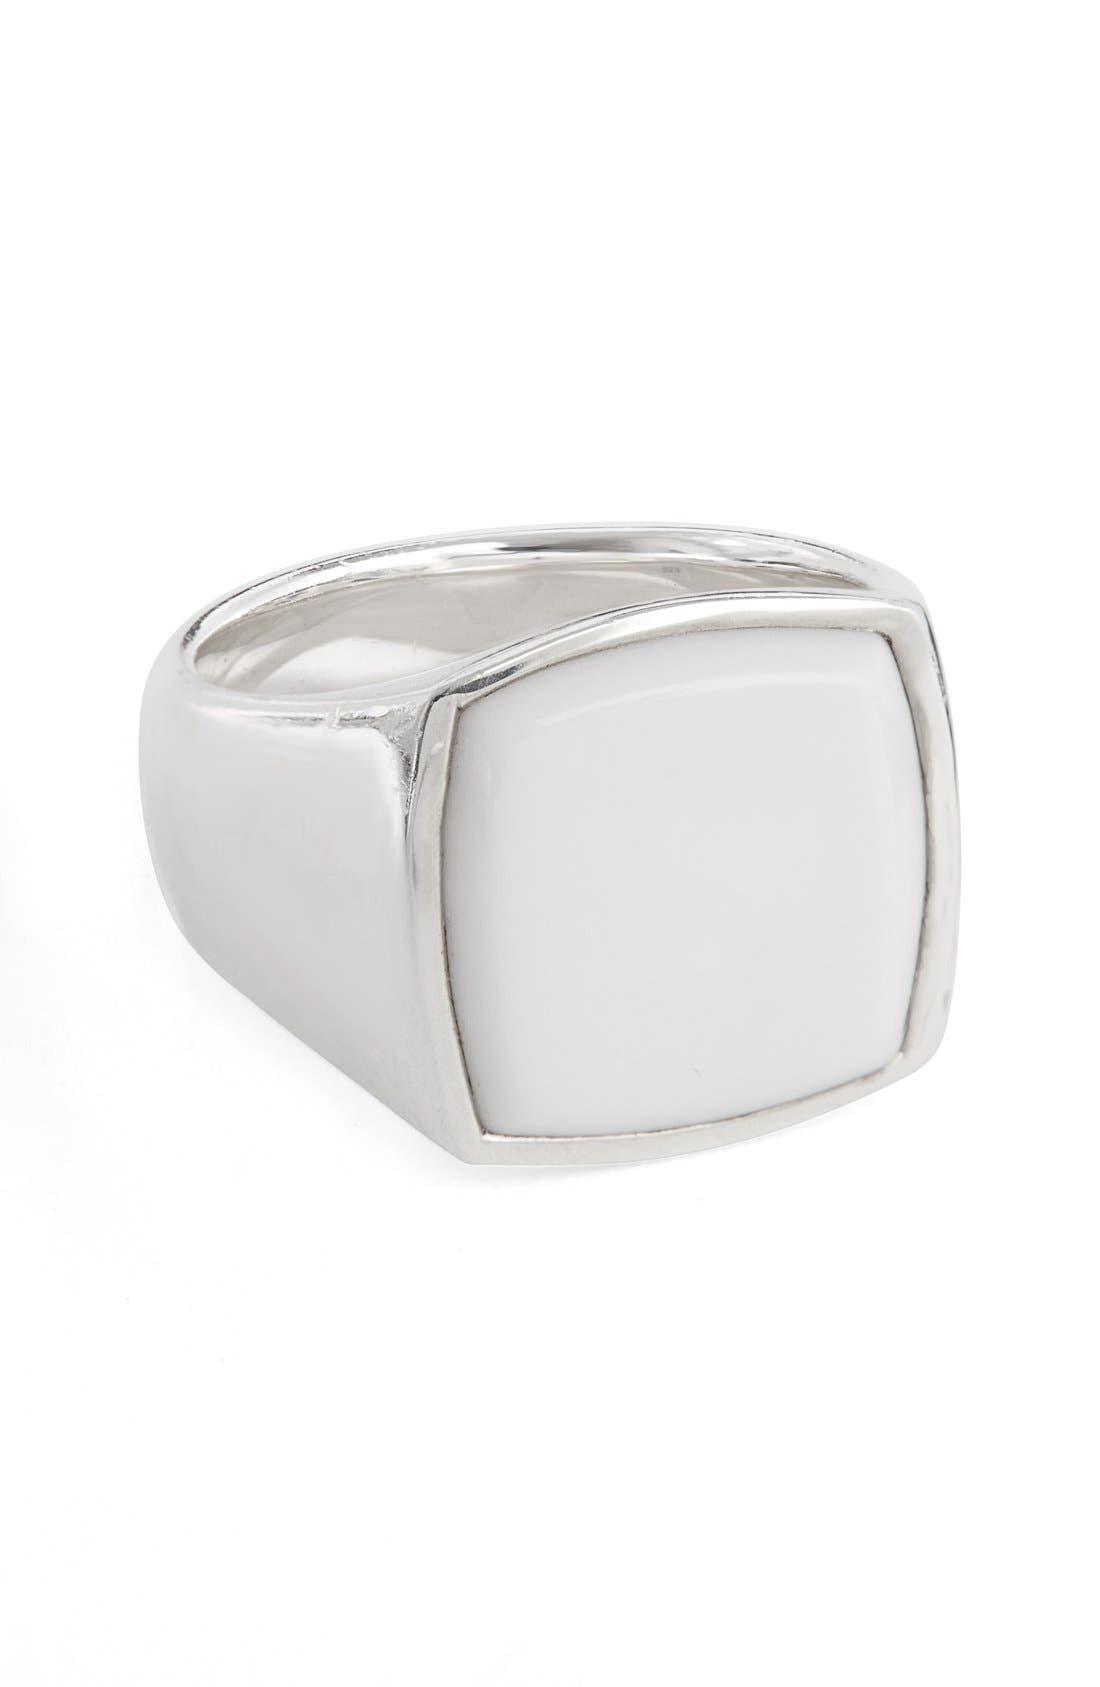 White Agate Cushion Signet Ring,                             Main thumbnail 1, color,                             042